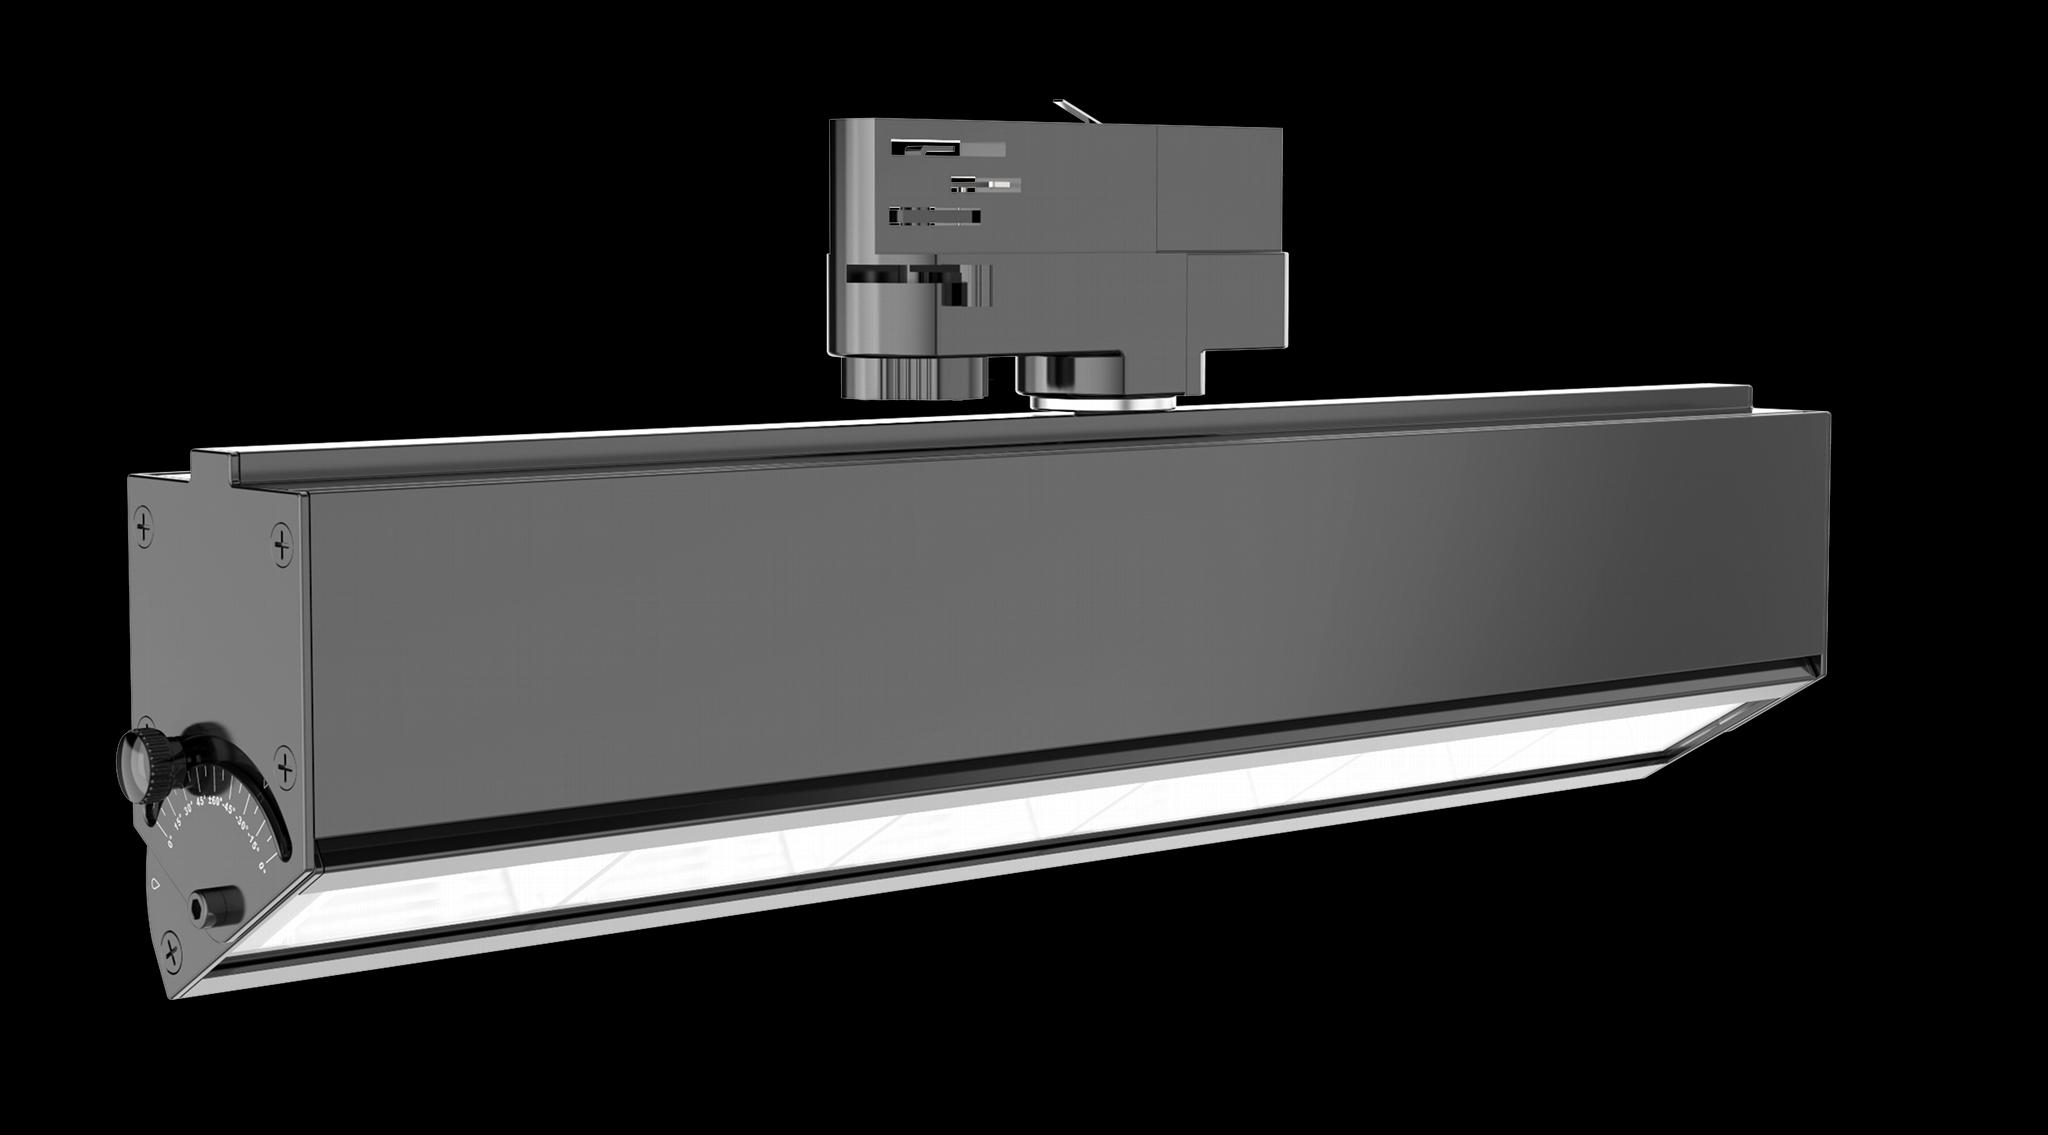 Bricks Rotatable 350 Series Linear LED Track Light Motion Sensor 5years warranty 2